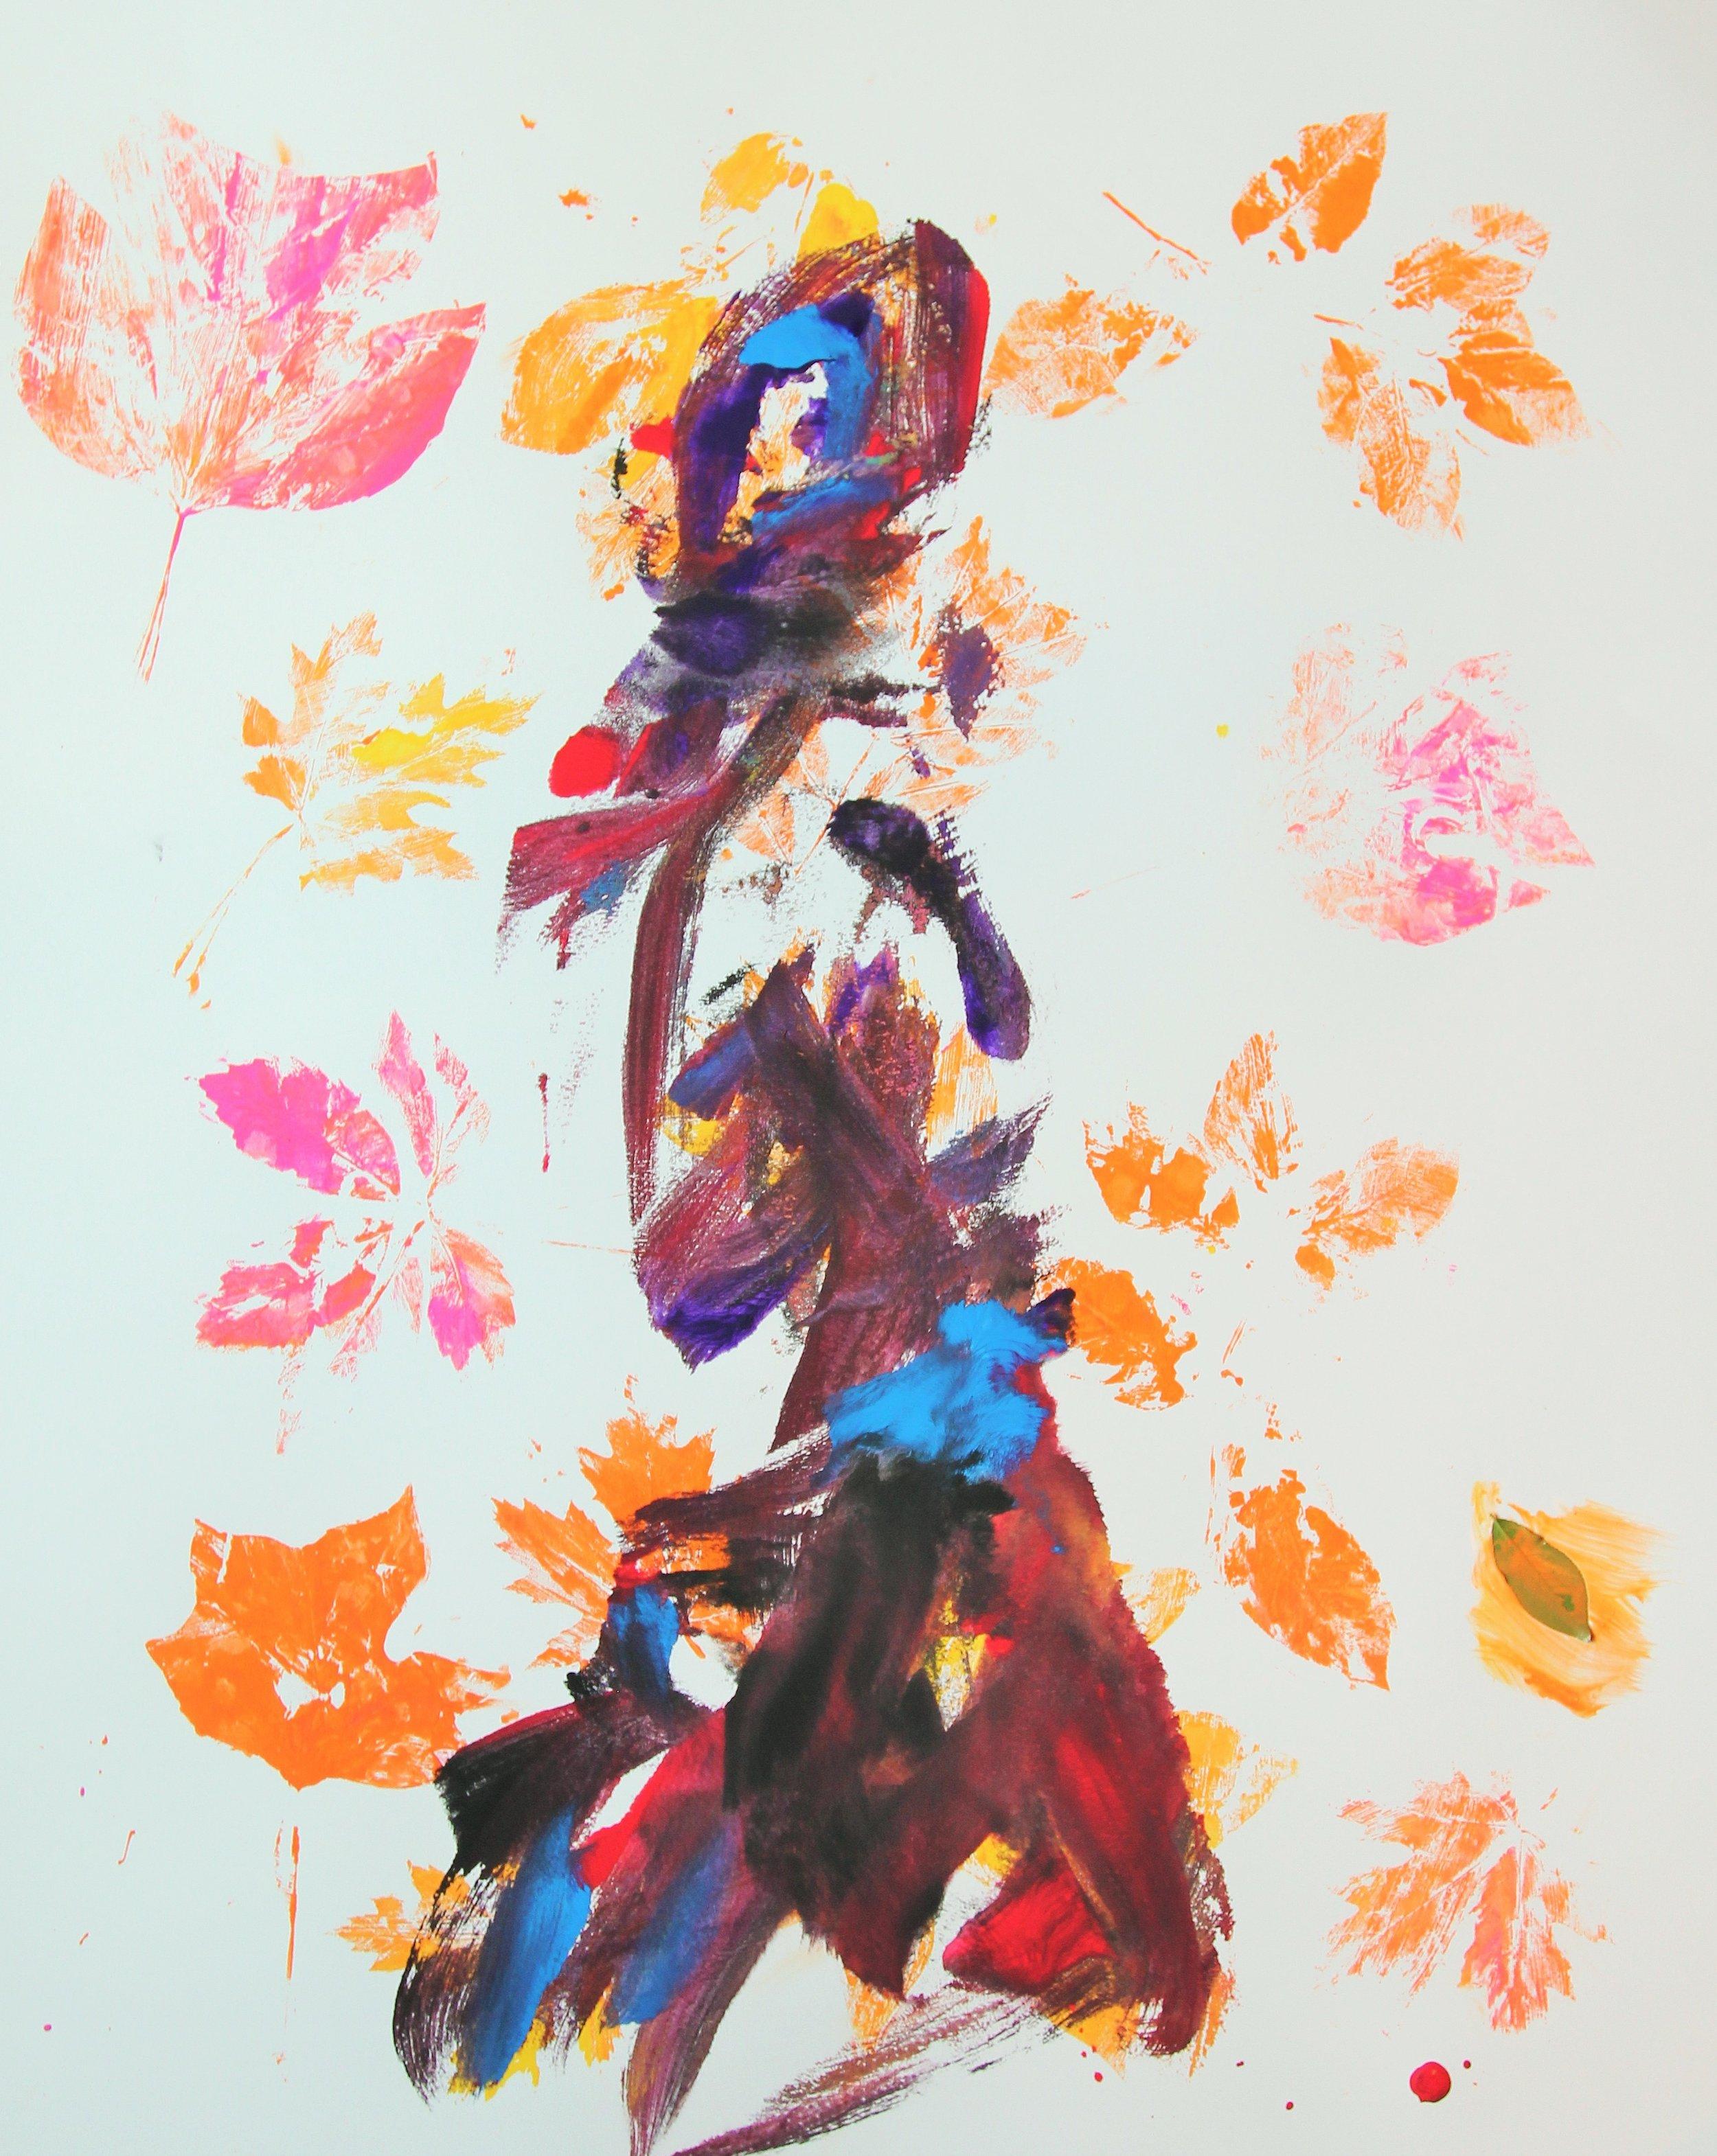 Mother Art (Tribute to Aviva Rahmani) Sally Deskins acrylic on board, 2016